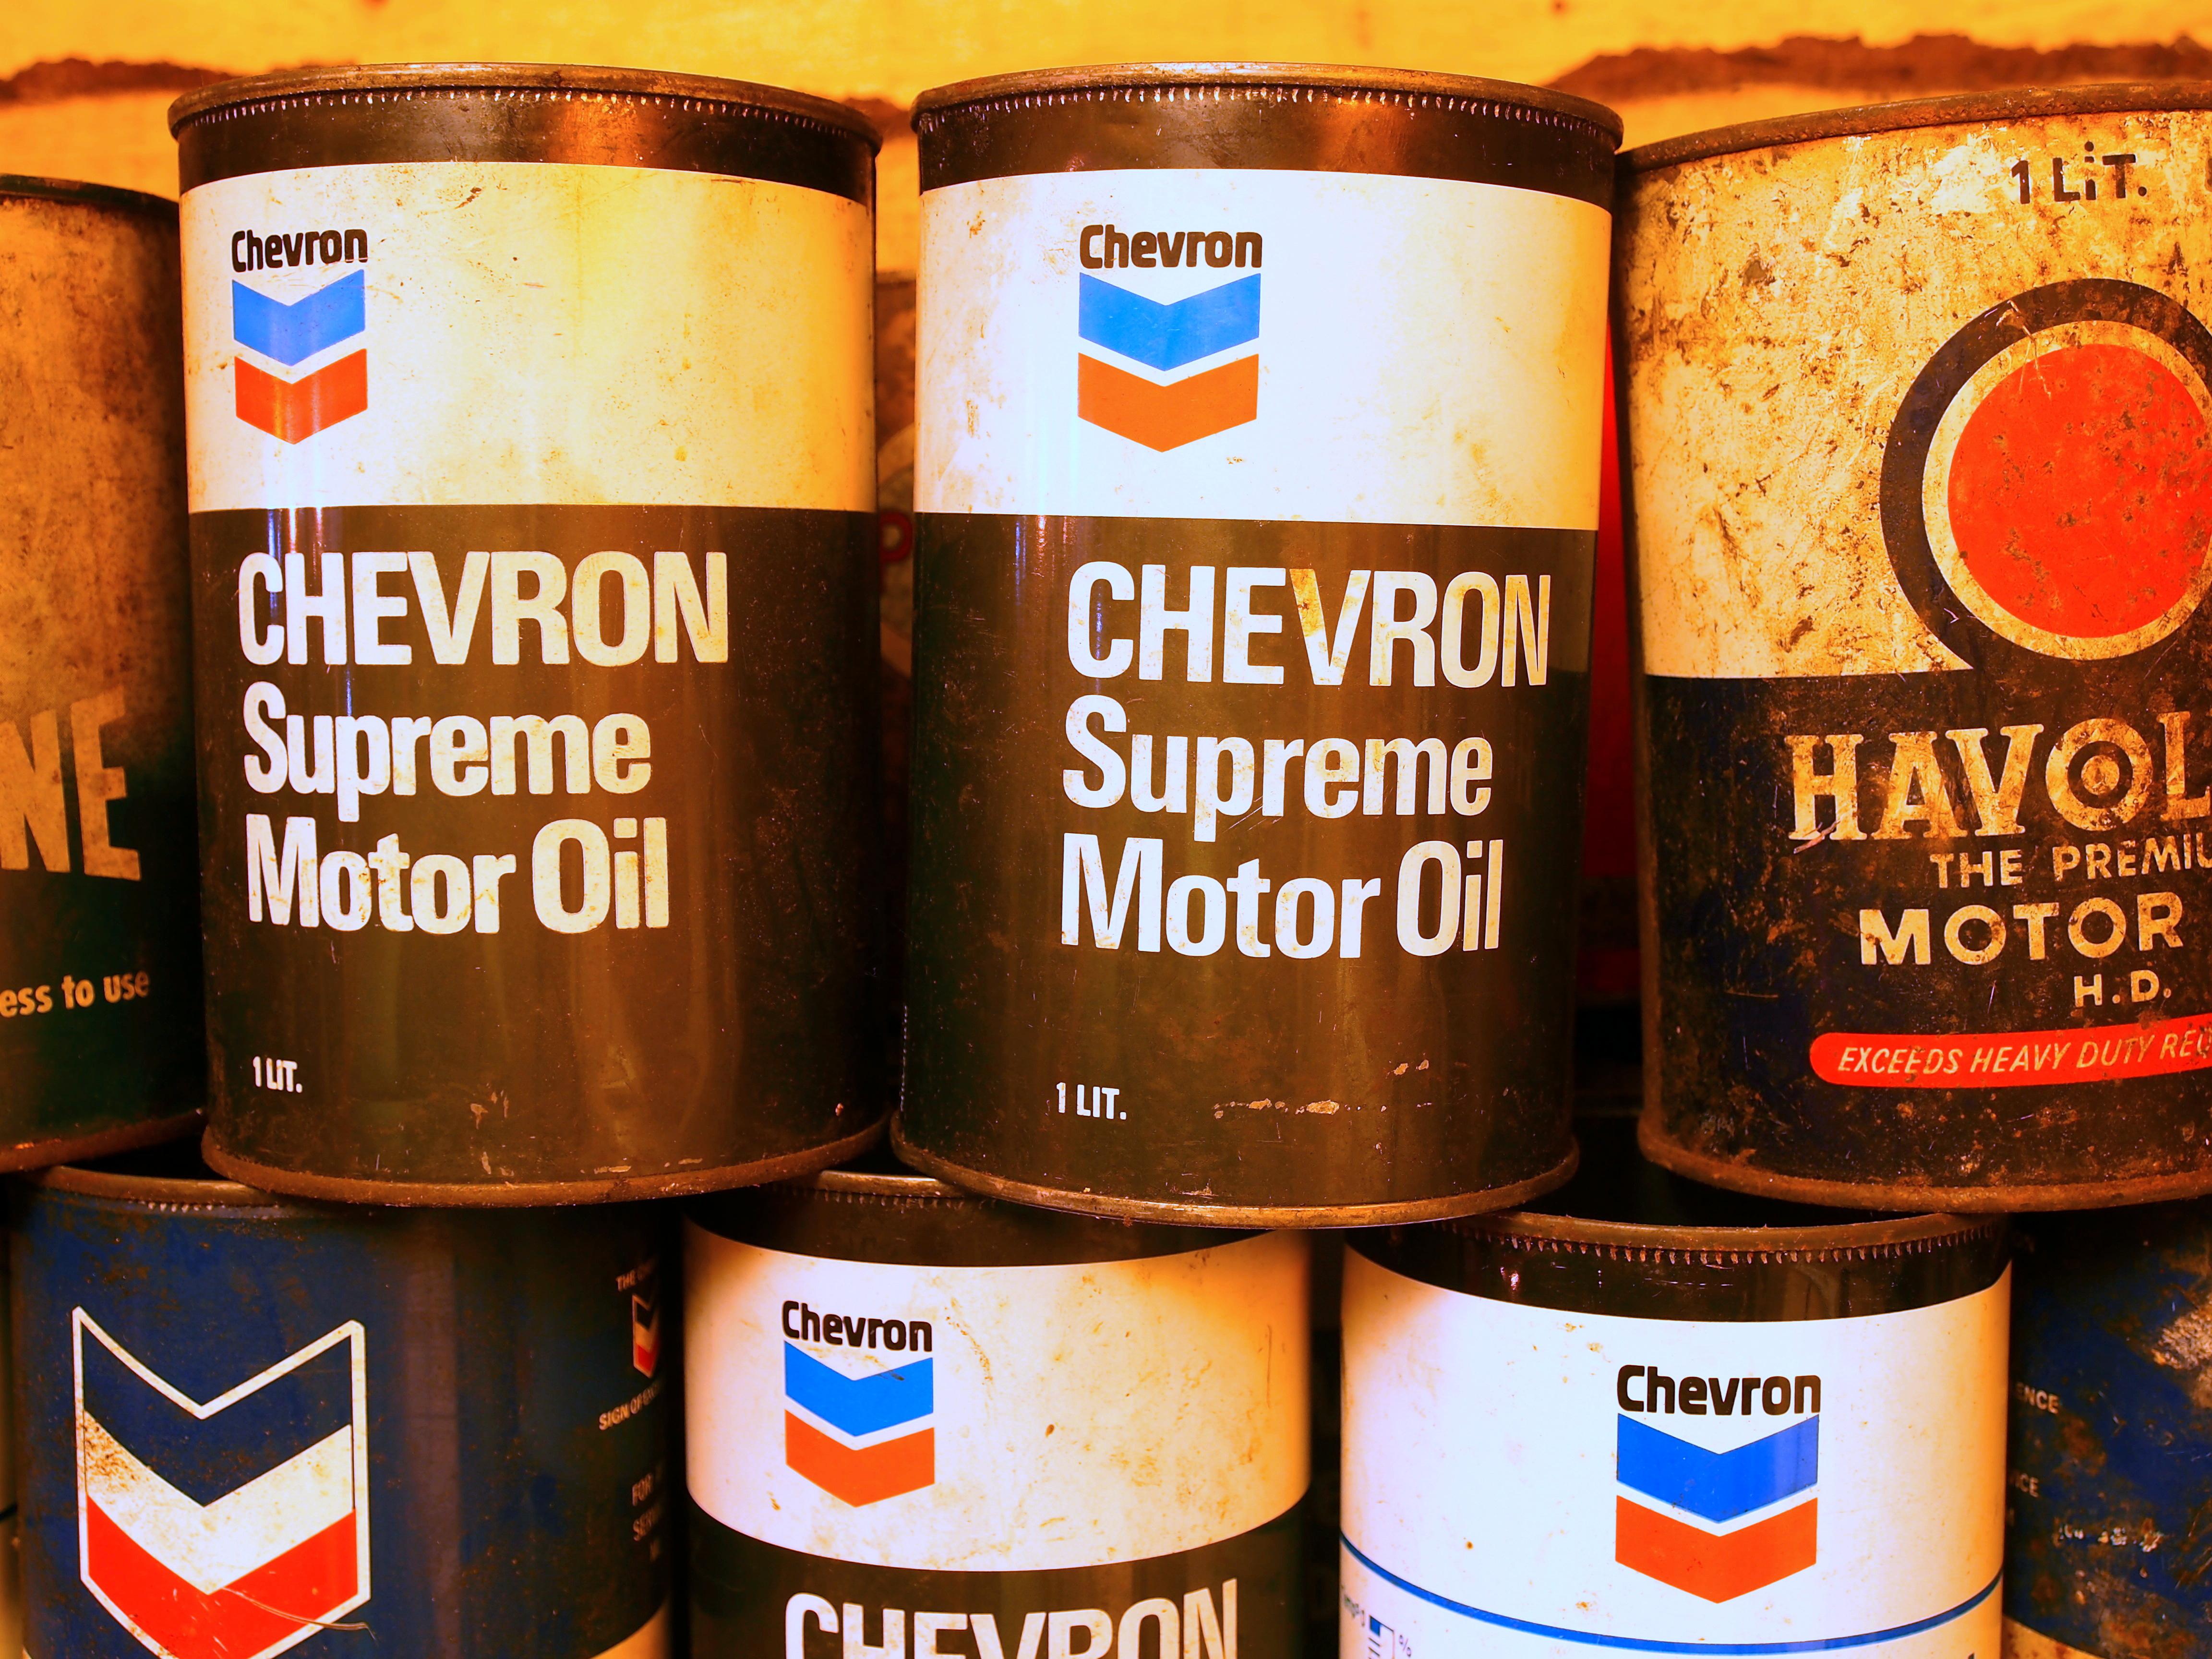 File Chevron Supreme Motor Oil Jpg Wikimedia Commons